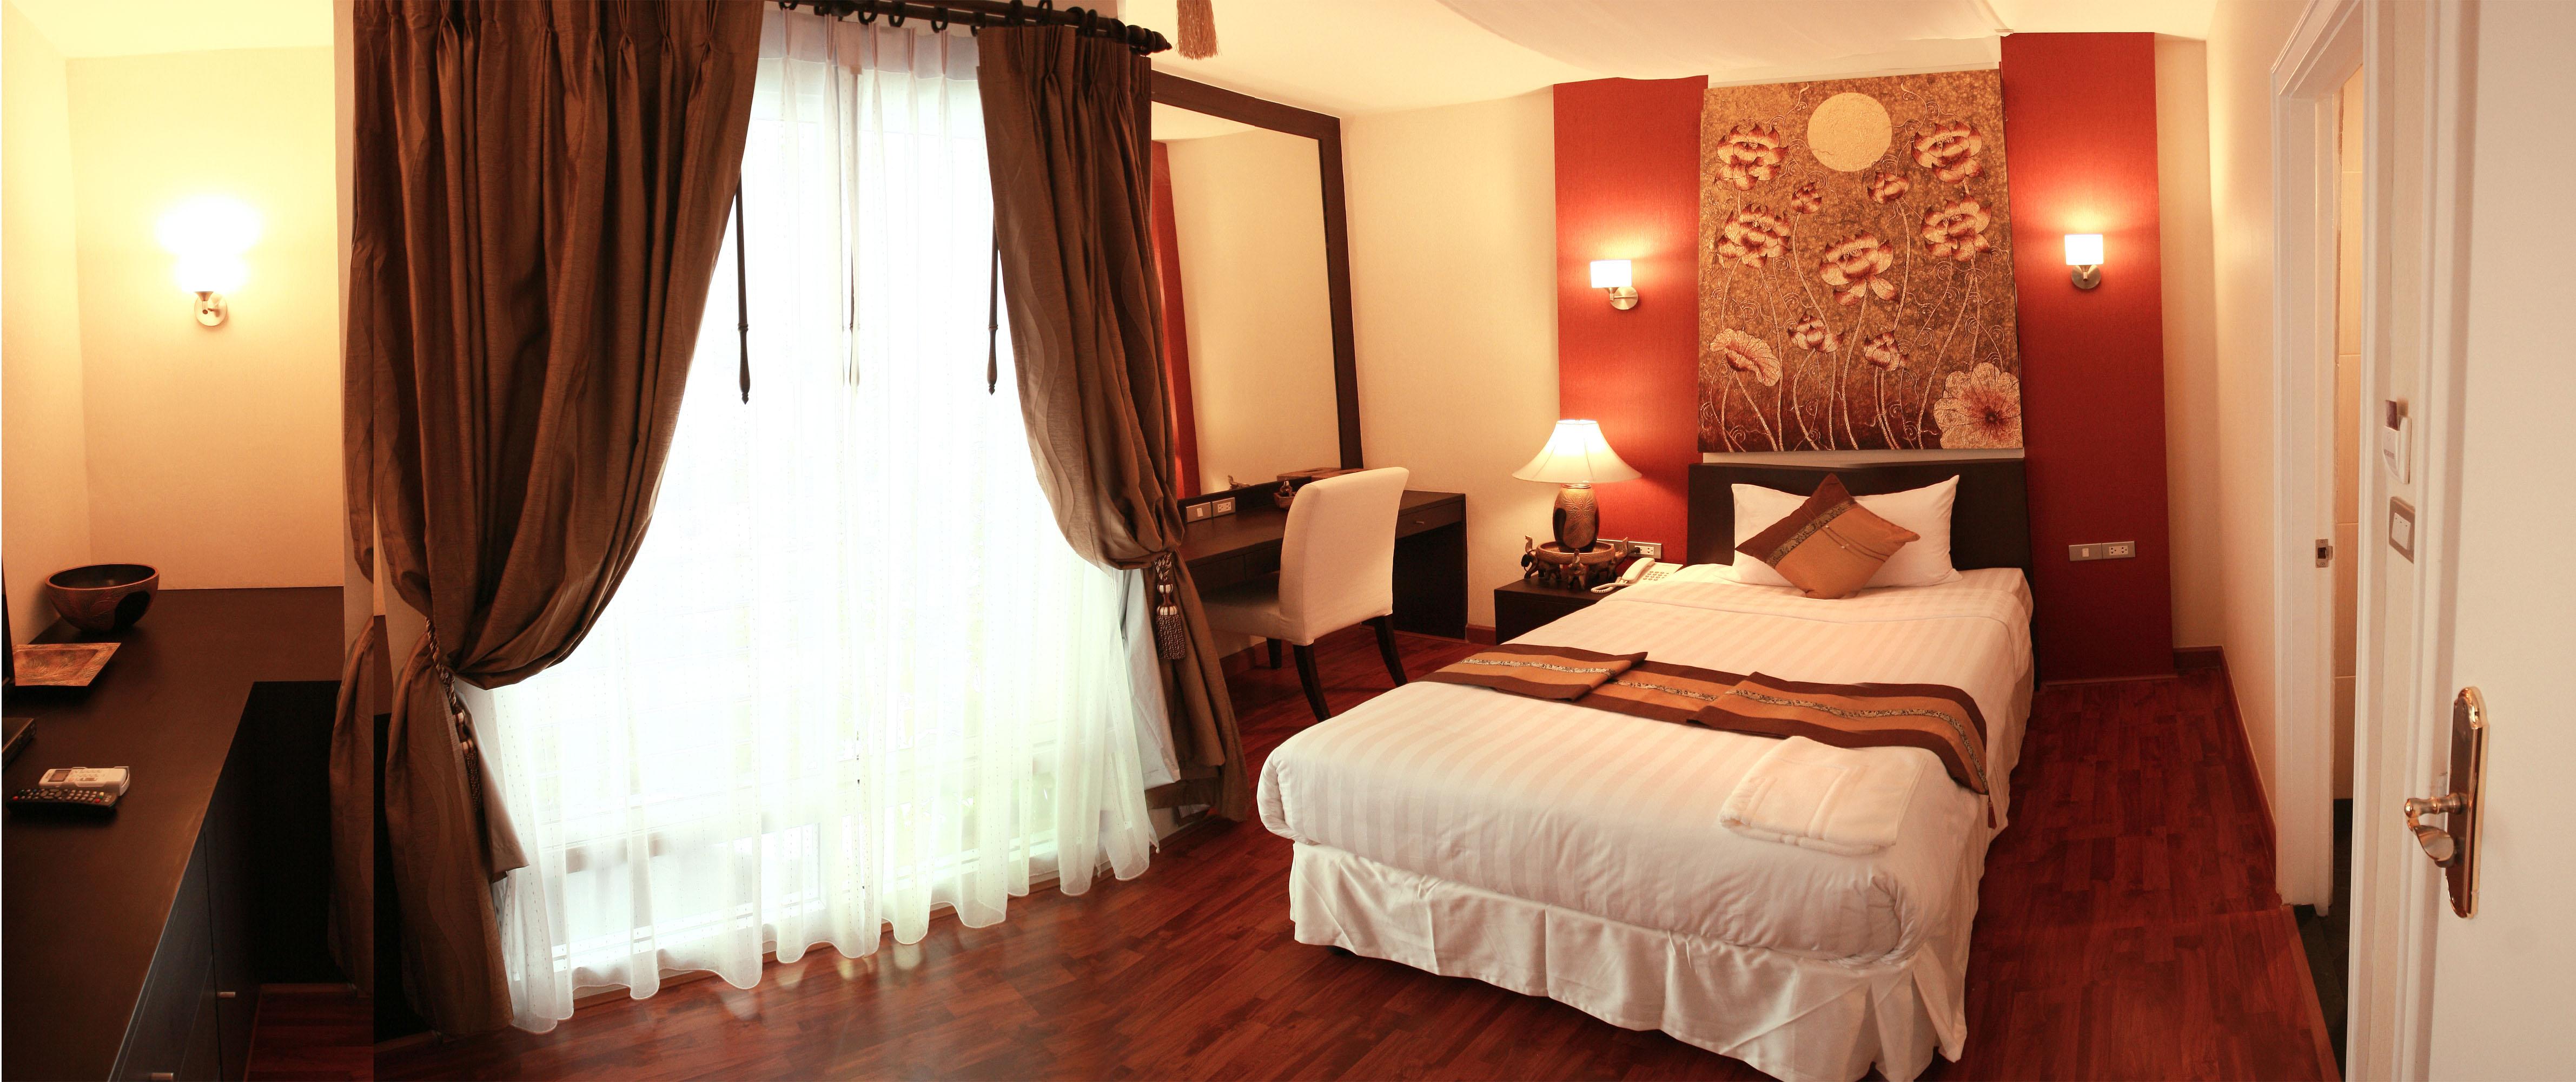 hotel thai bkk hotel accommodation hotel bangkok hotel rooms